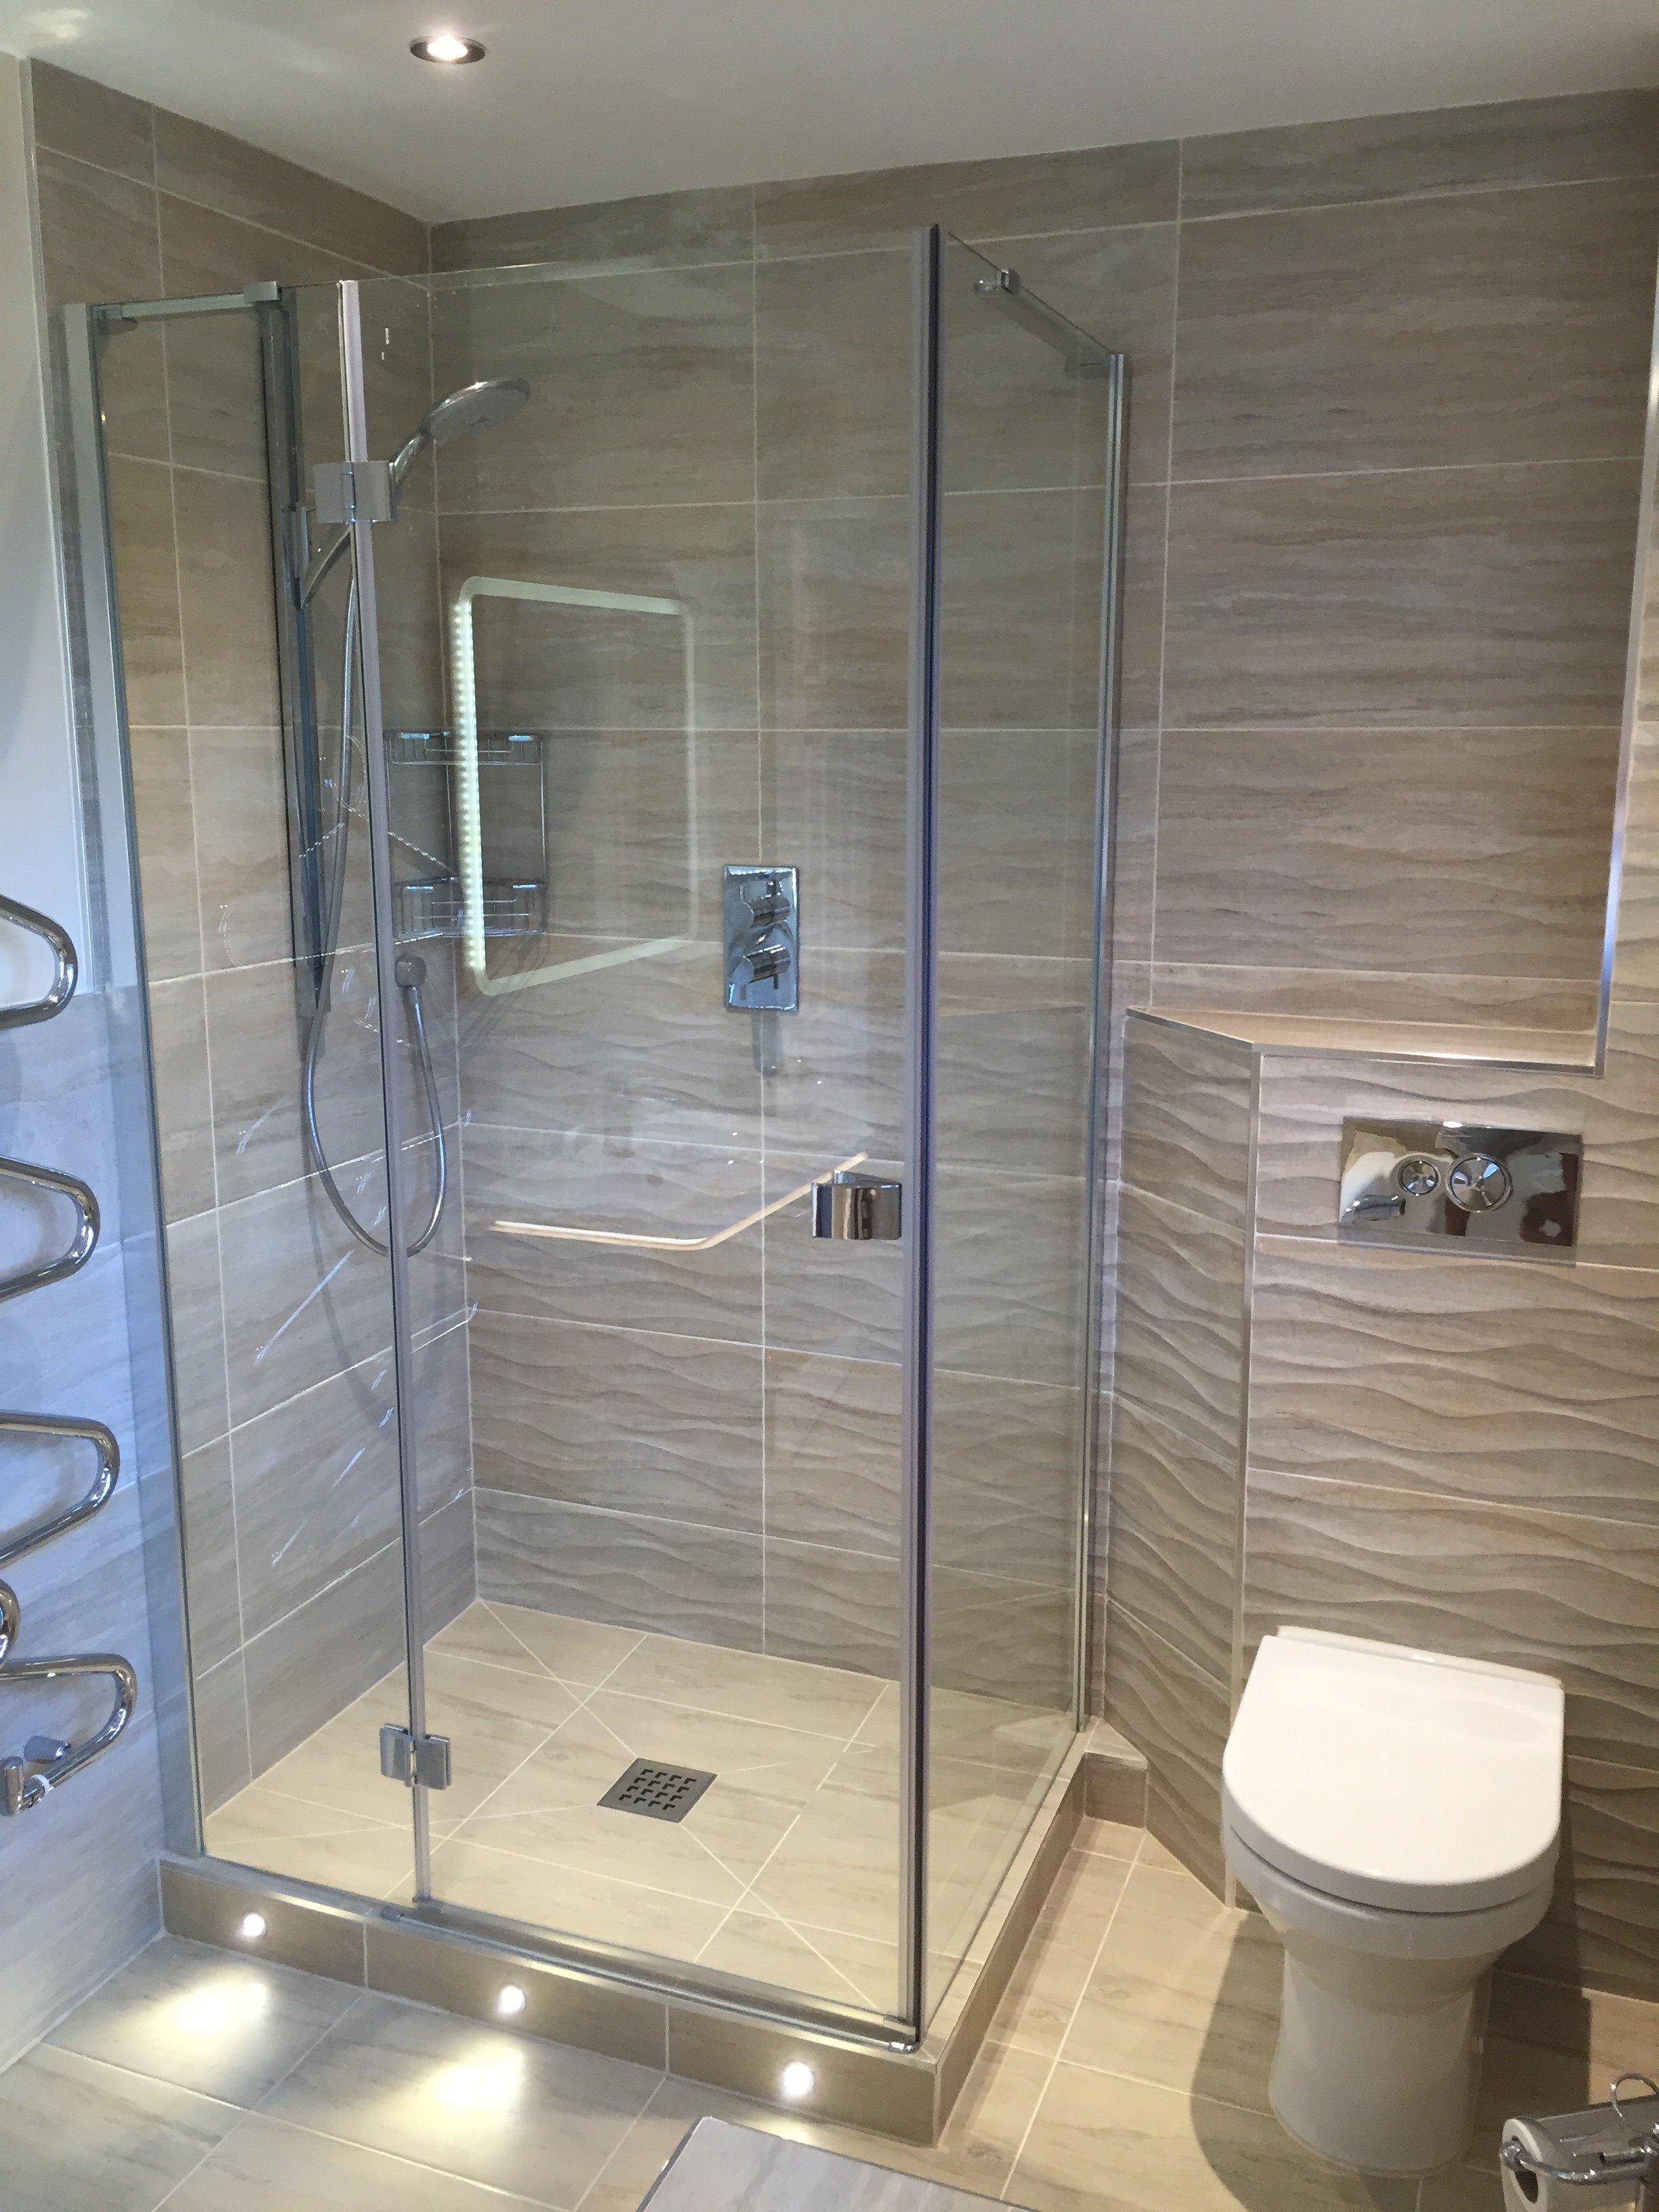 Modern Yet Practical Shower Room